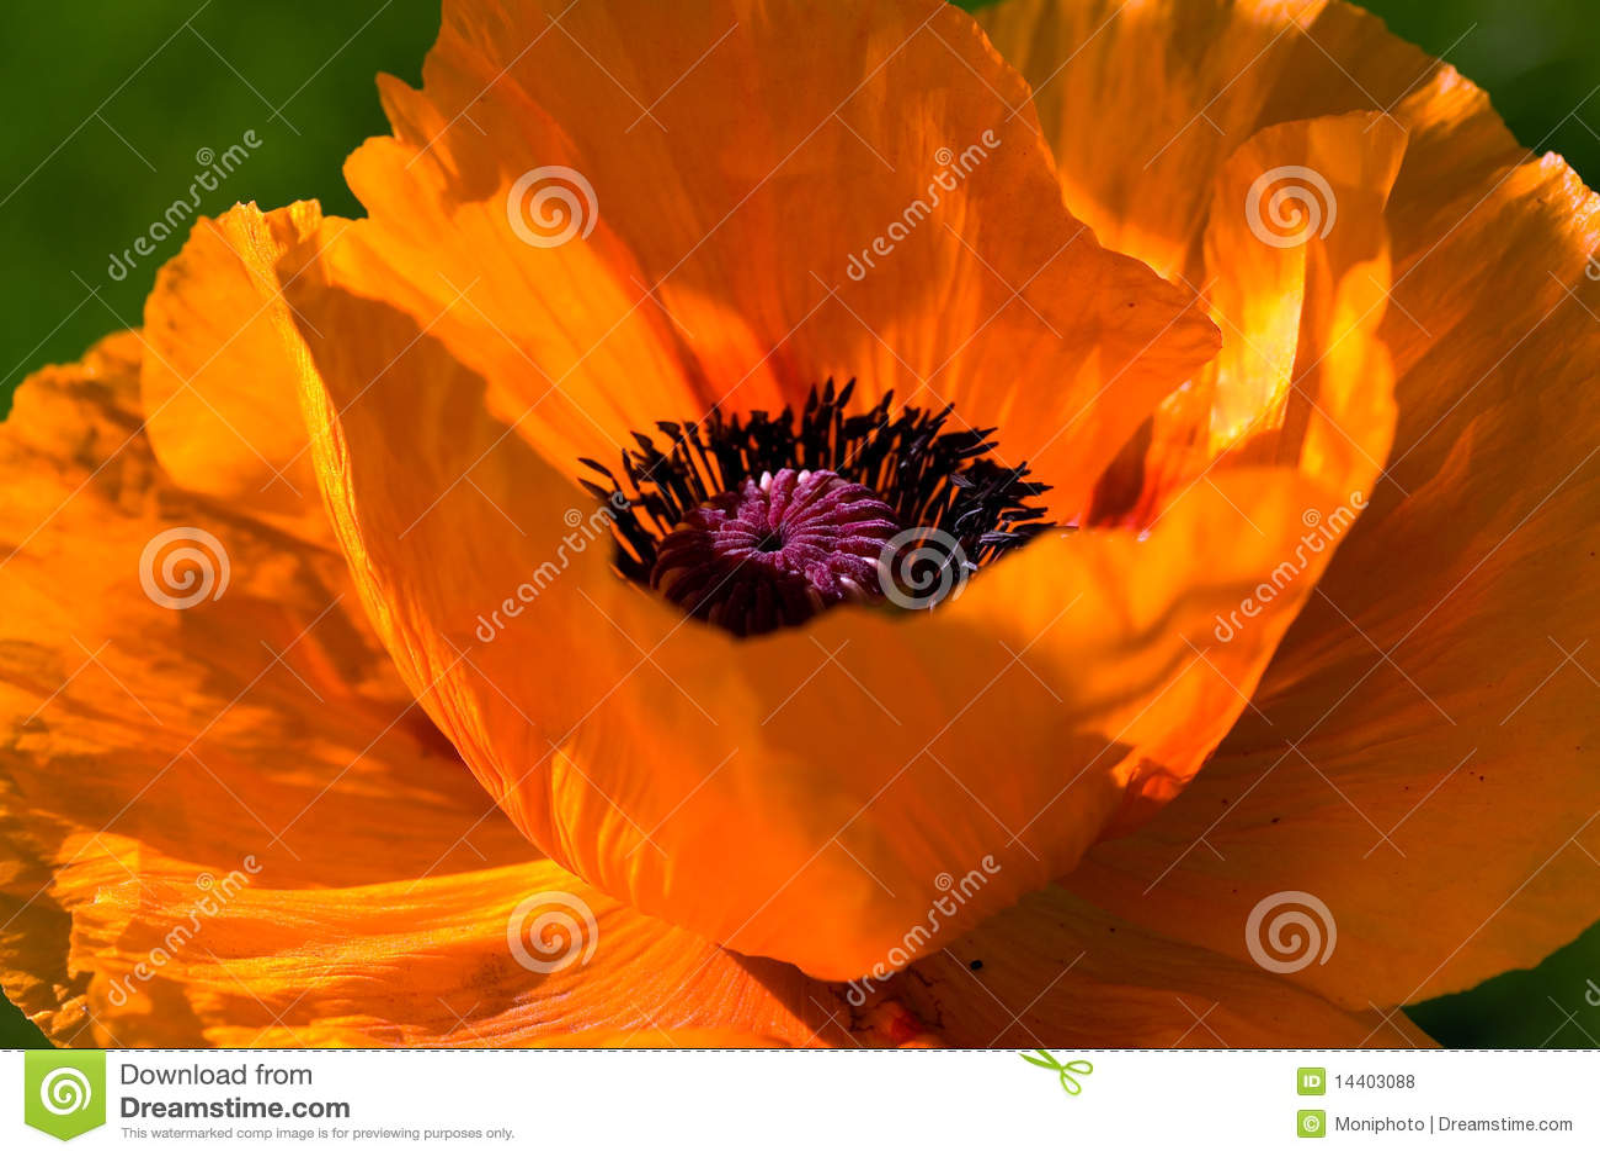 Beautiful big orange poppy flower stock photo image of memory download beautiful big orange poppy flower stock photo image of memory plant mightylinksfo